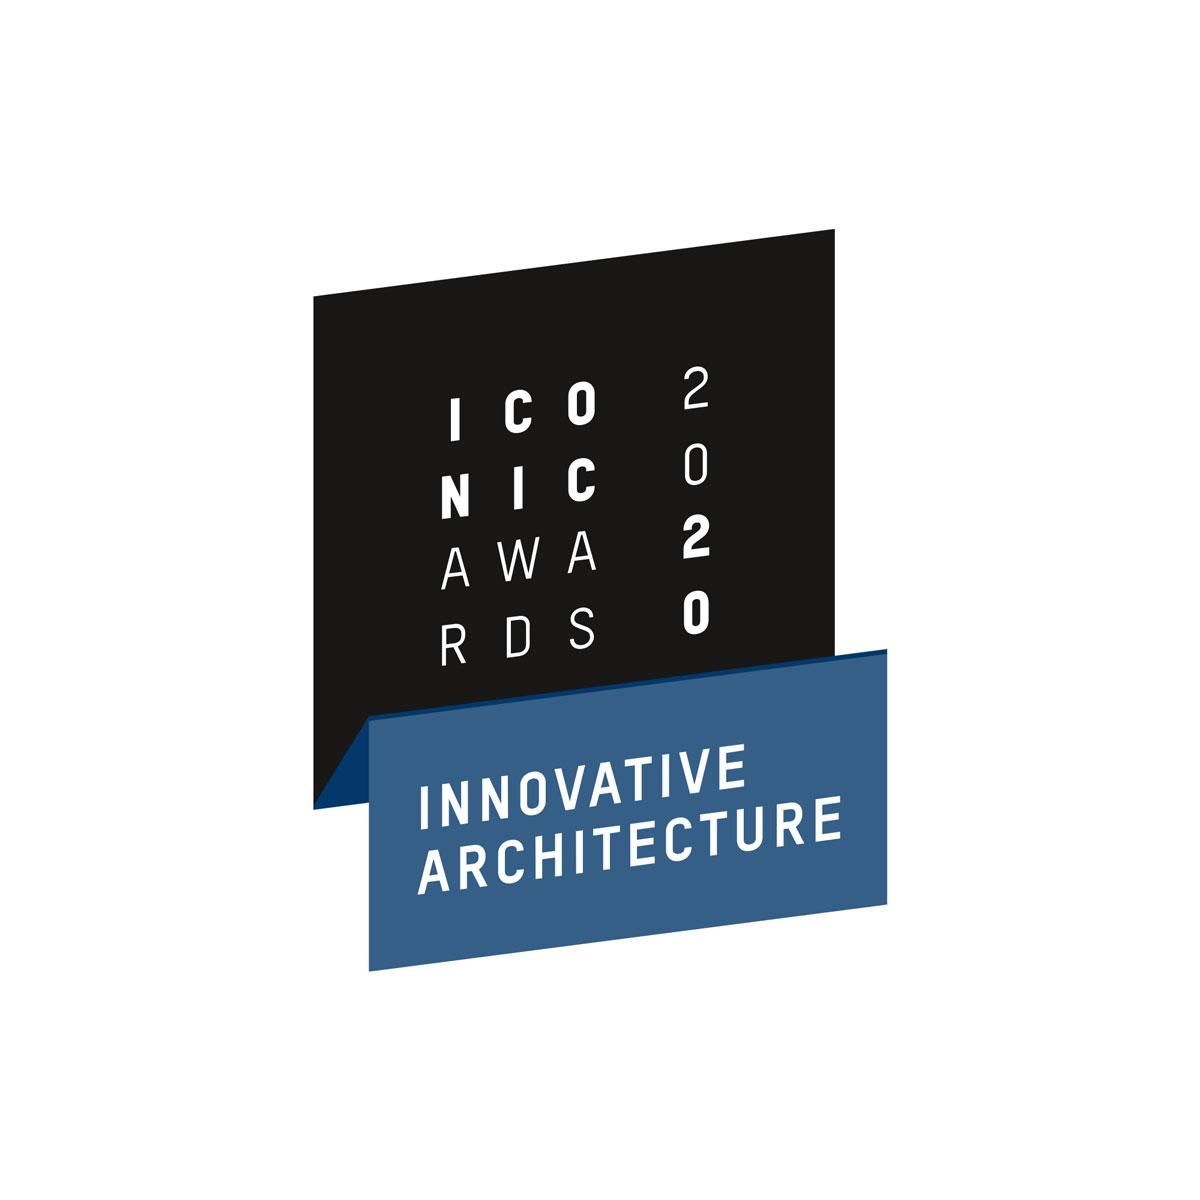 2020 ICONIC AWARDS Innovative Architecture